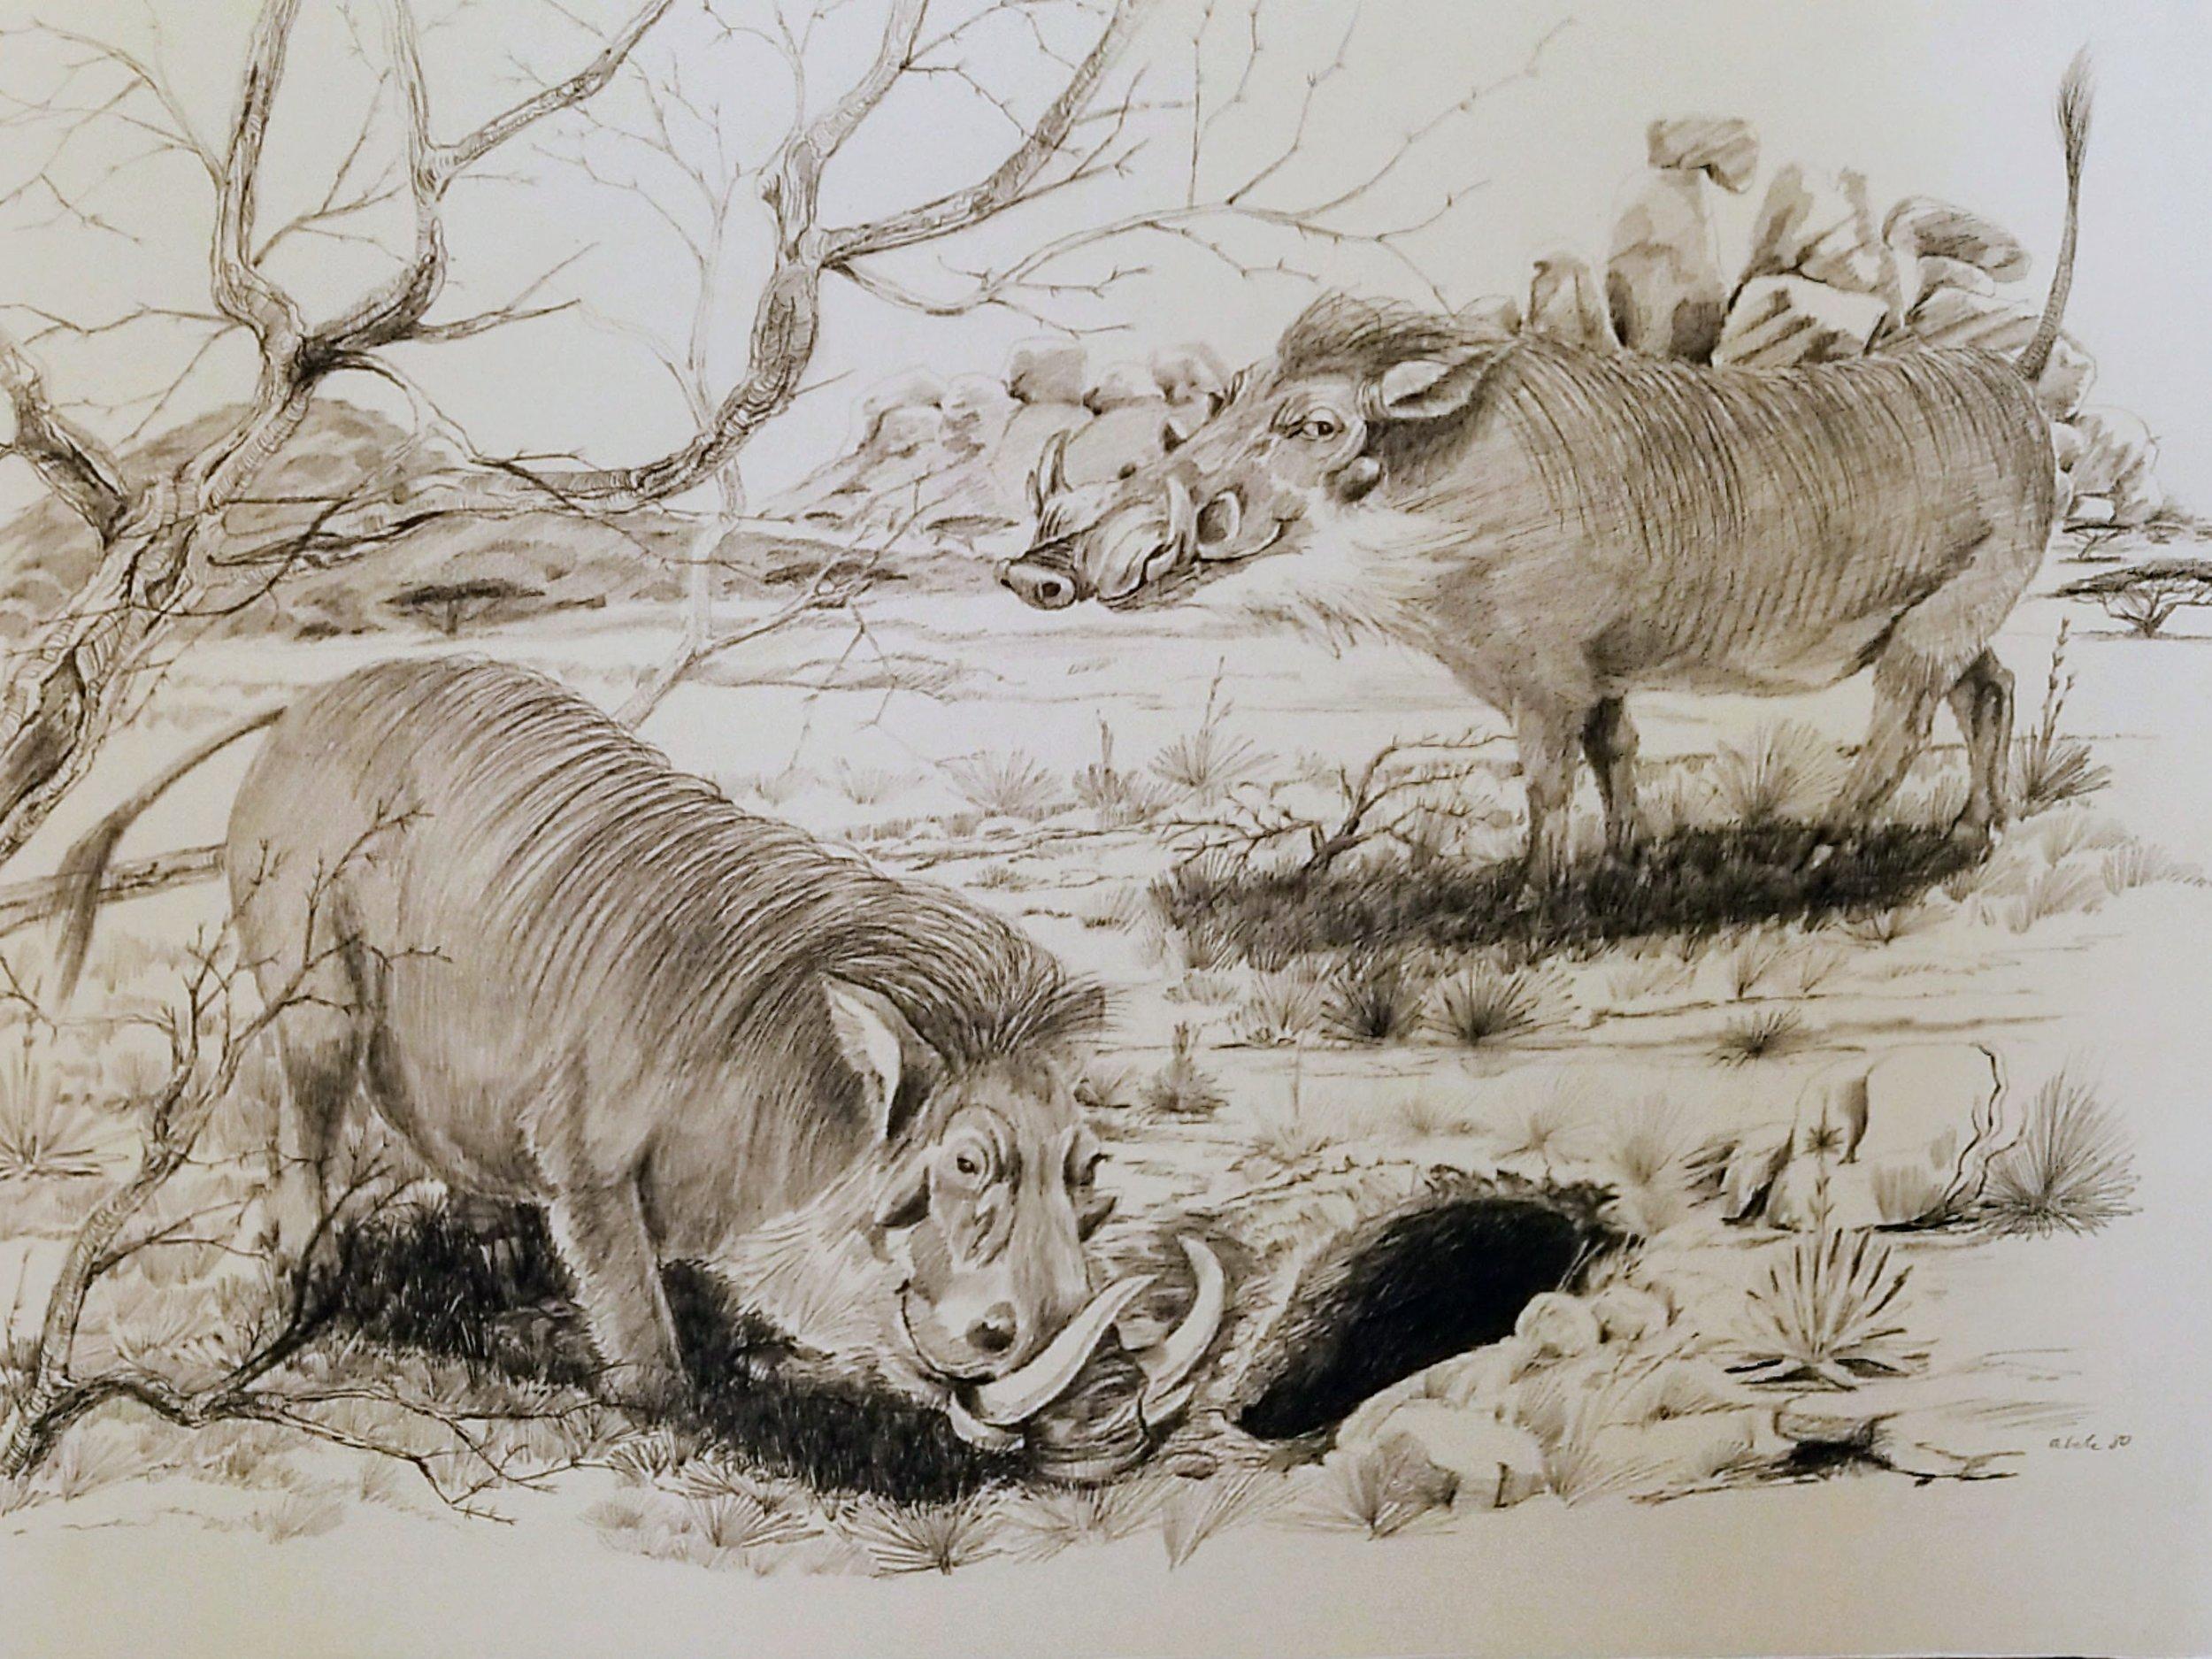 Warthogs Digging a Den